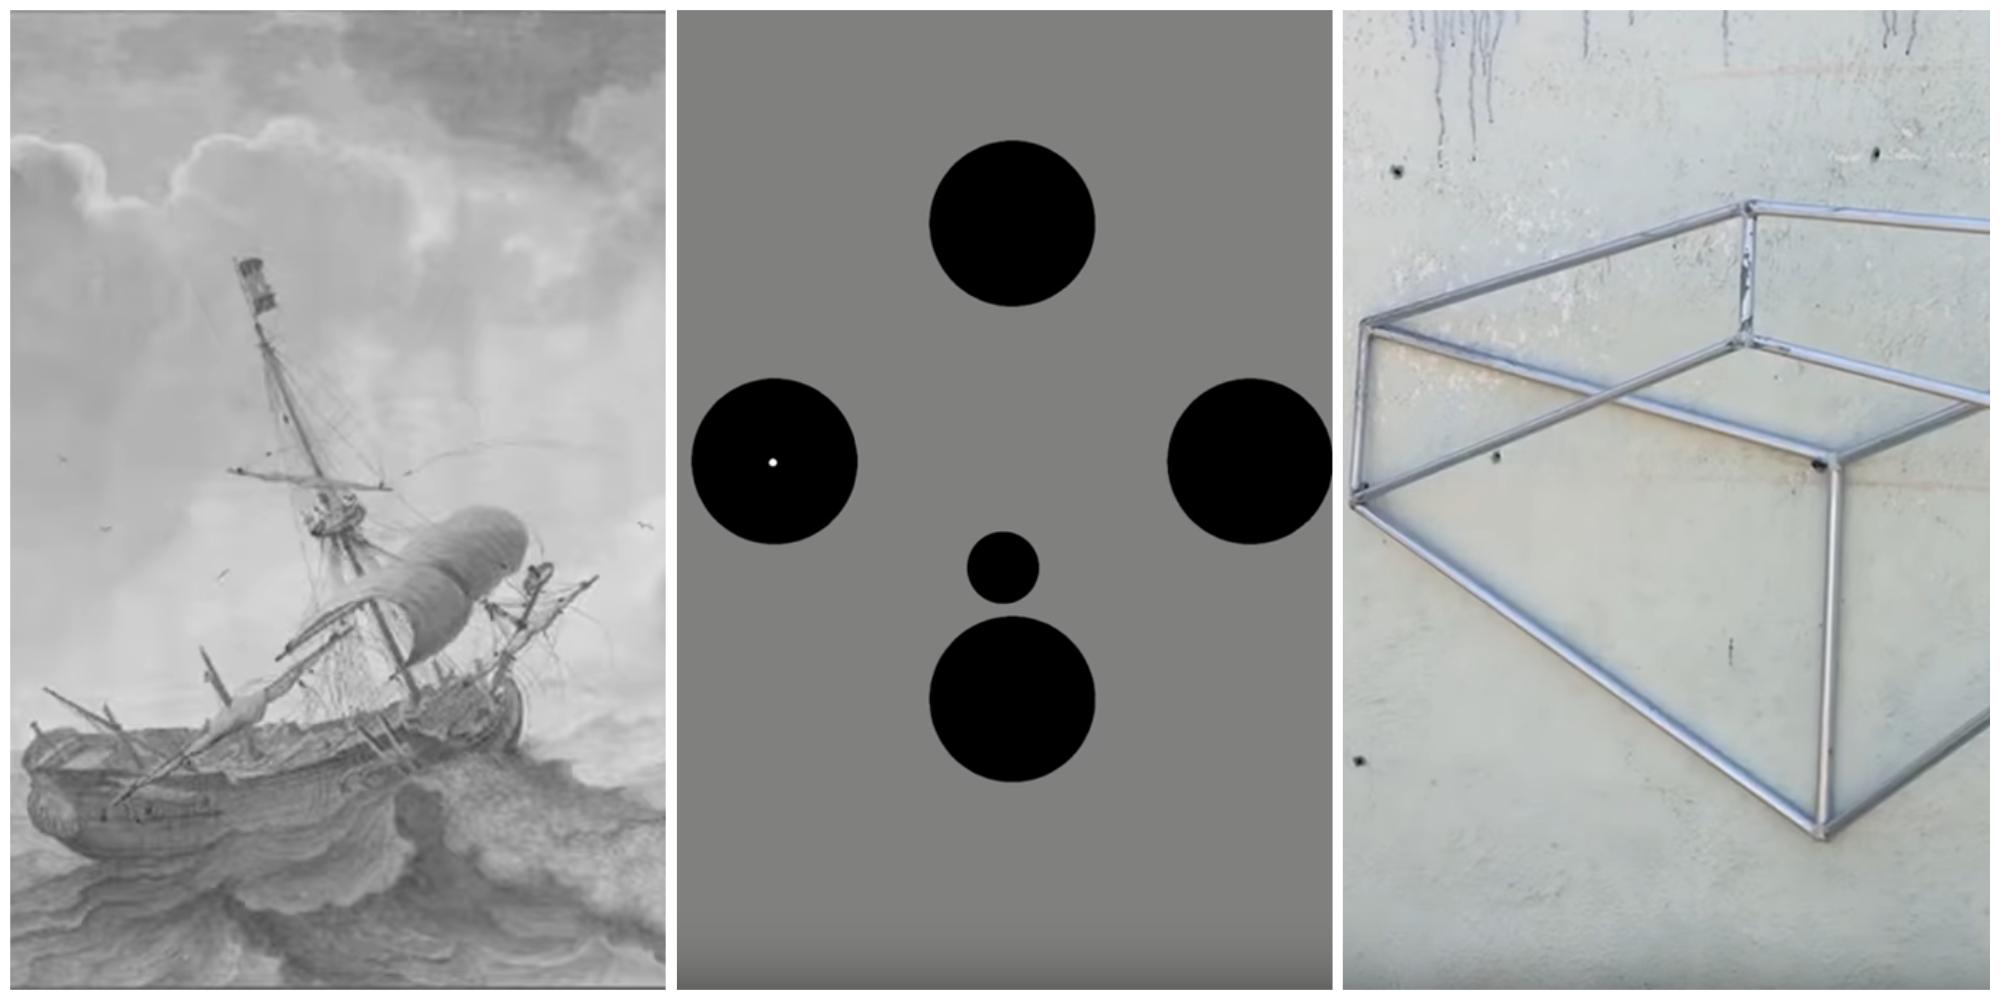 10 лучших оптических иллюзий 2019 года с конкурса Best Illusion of the Year